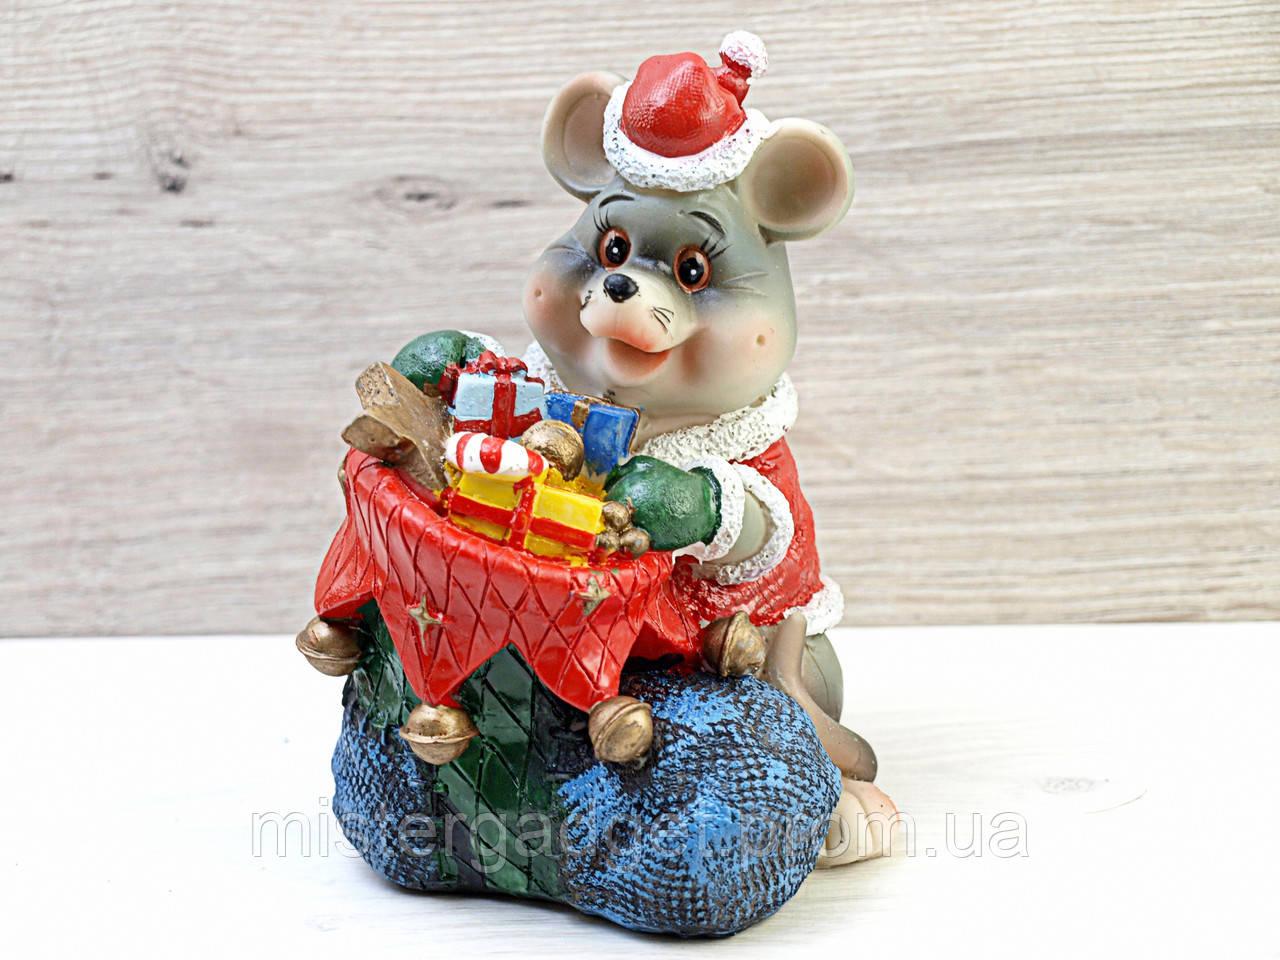 Сувенир копилка Крыса подарок